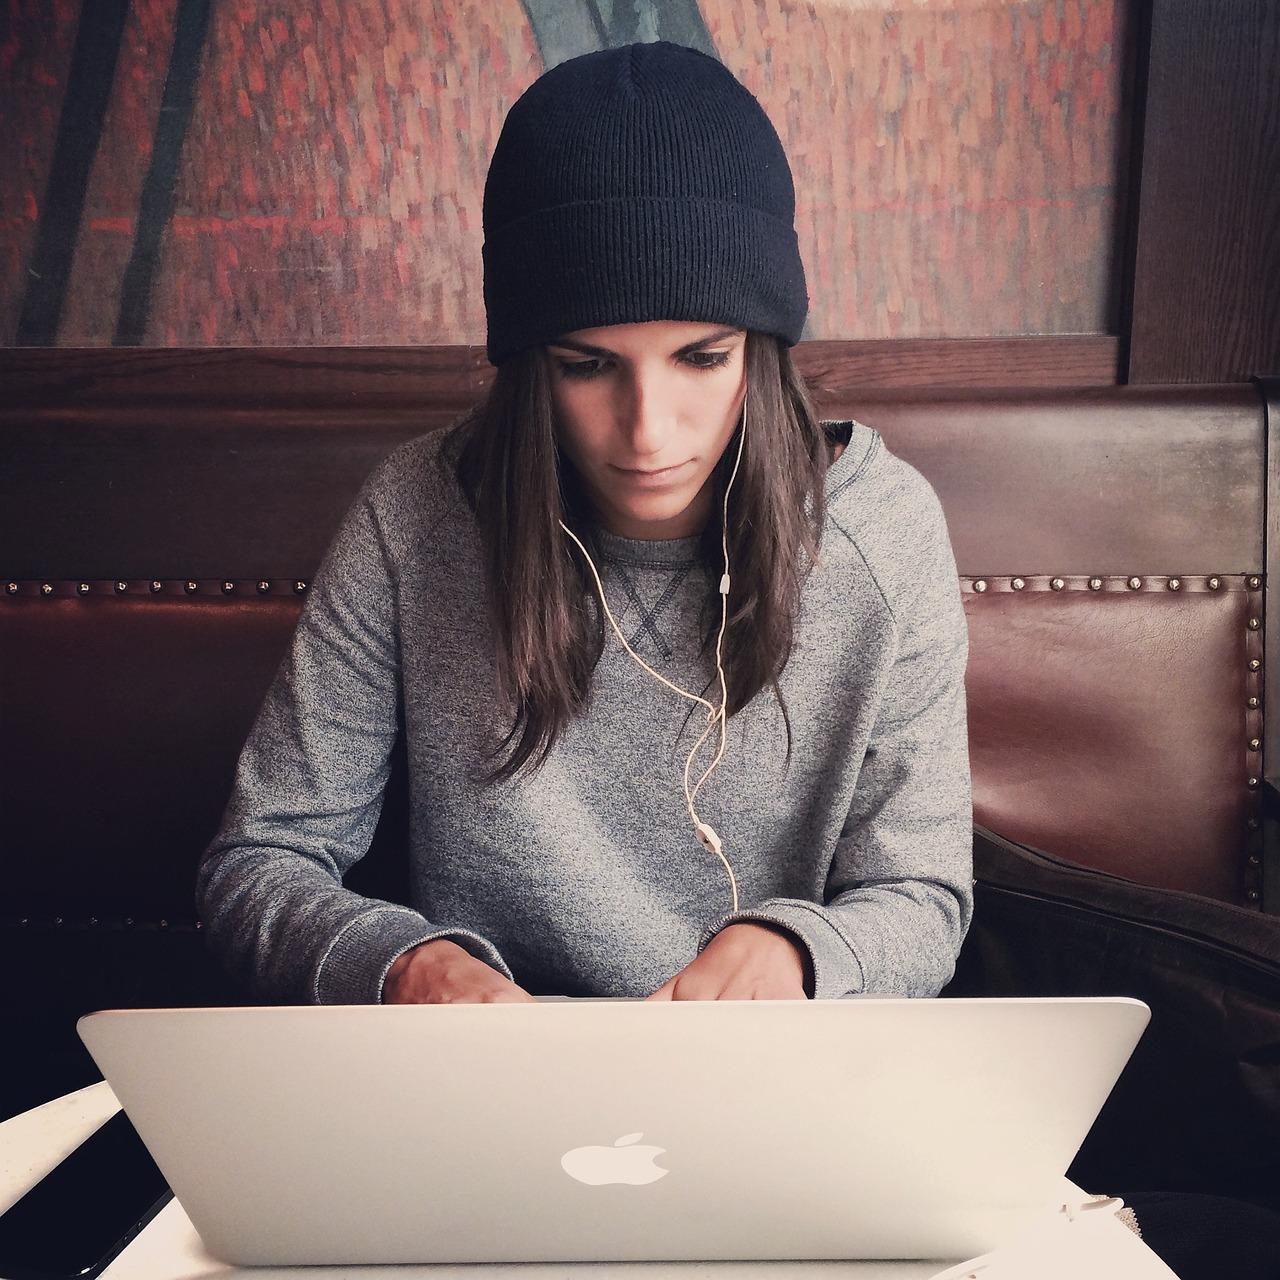 laptop, apple, macbook